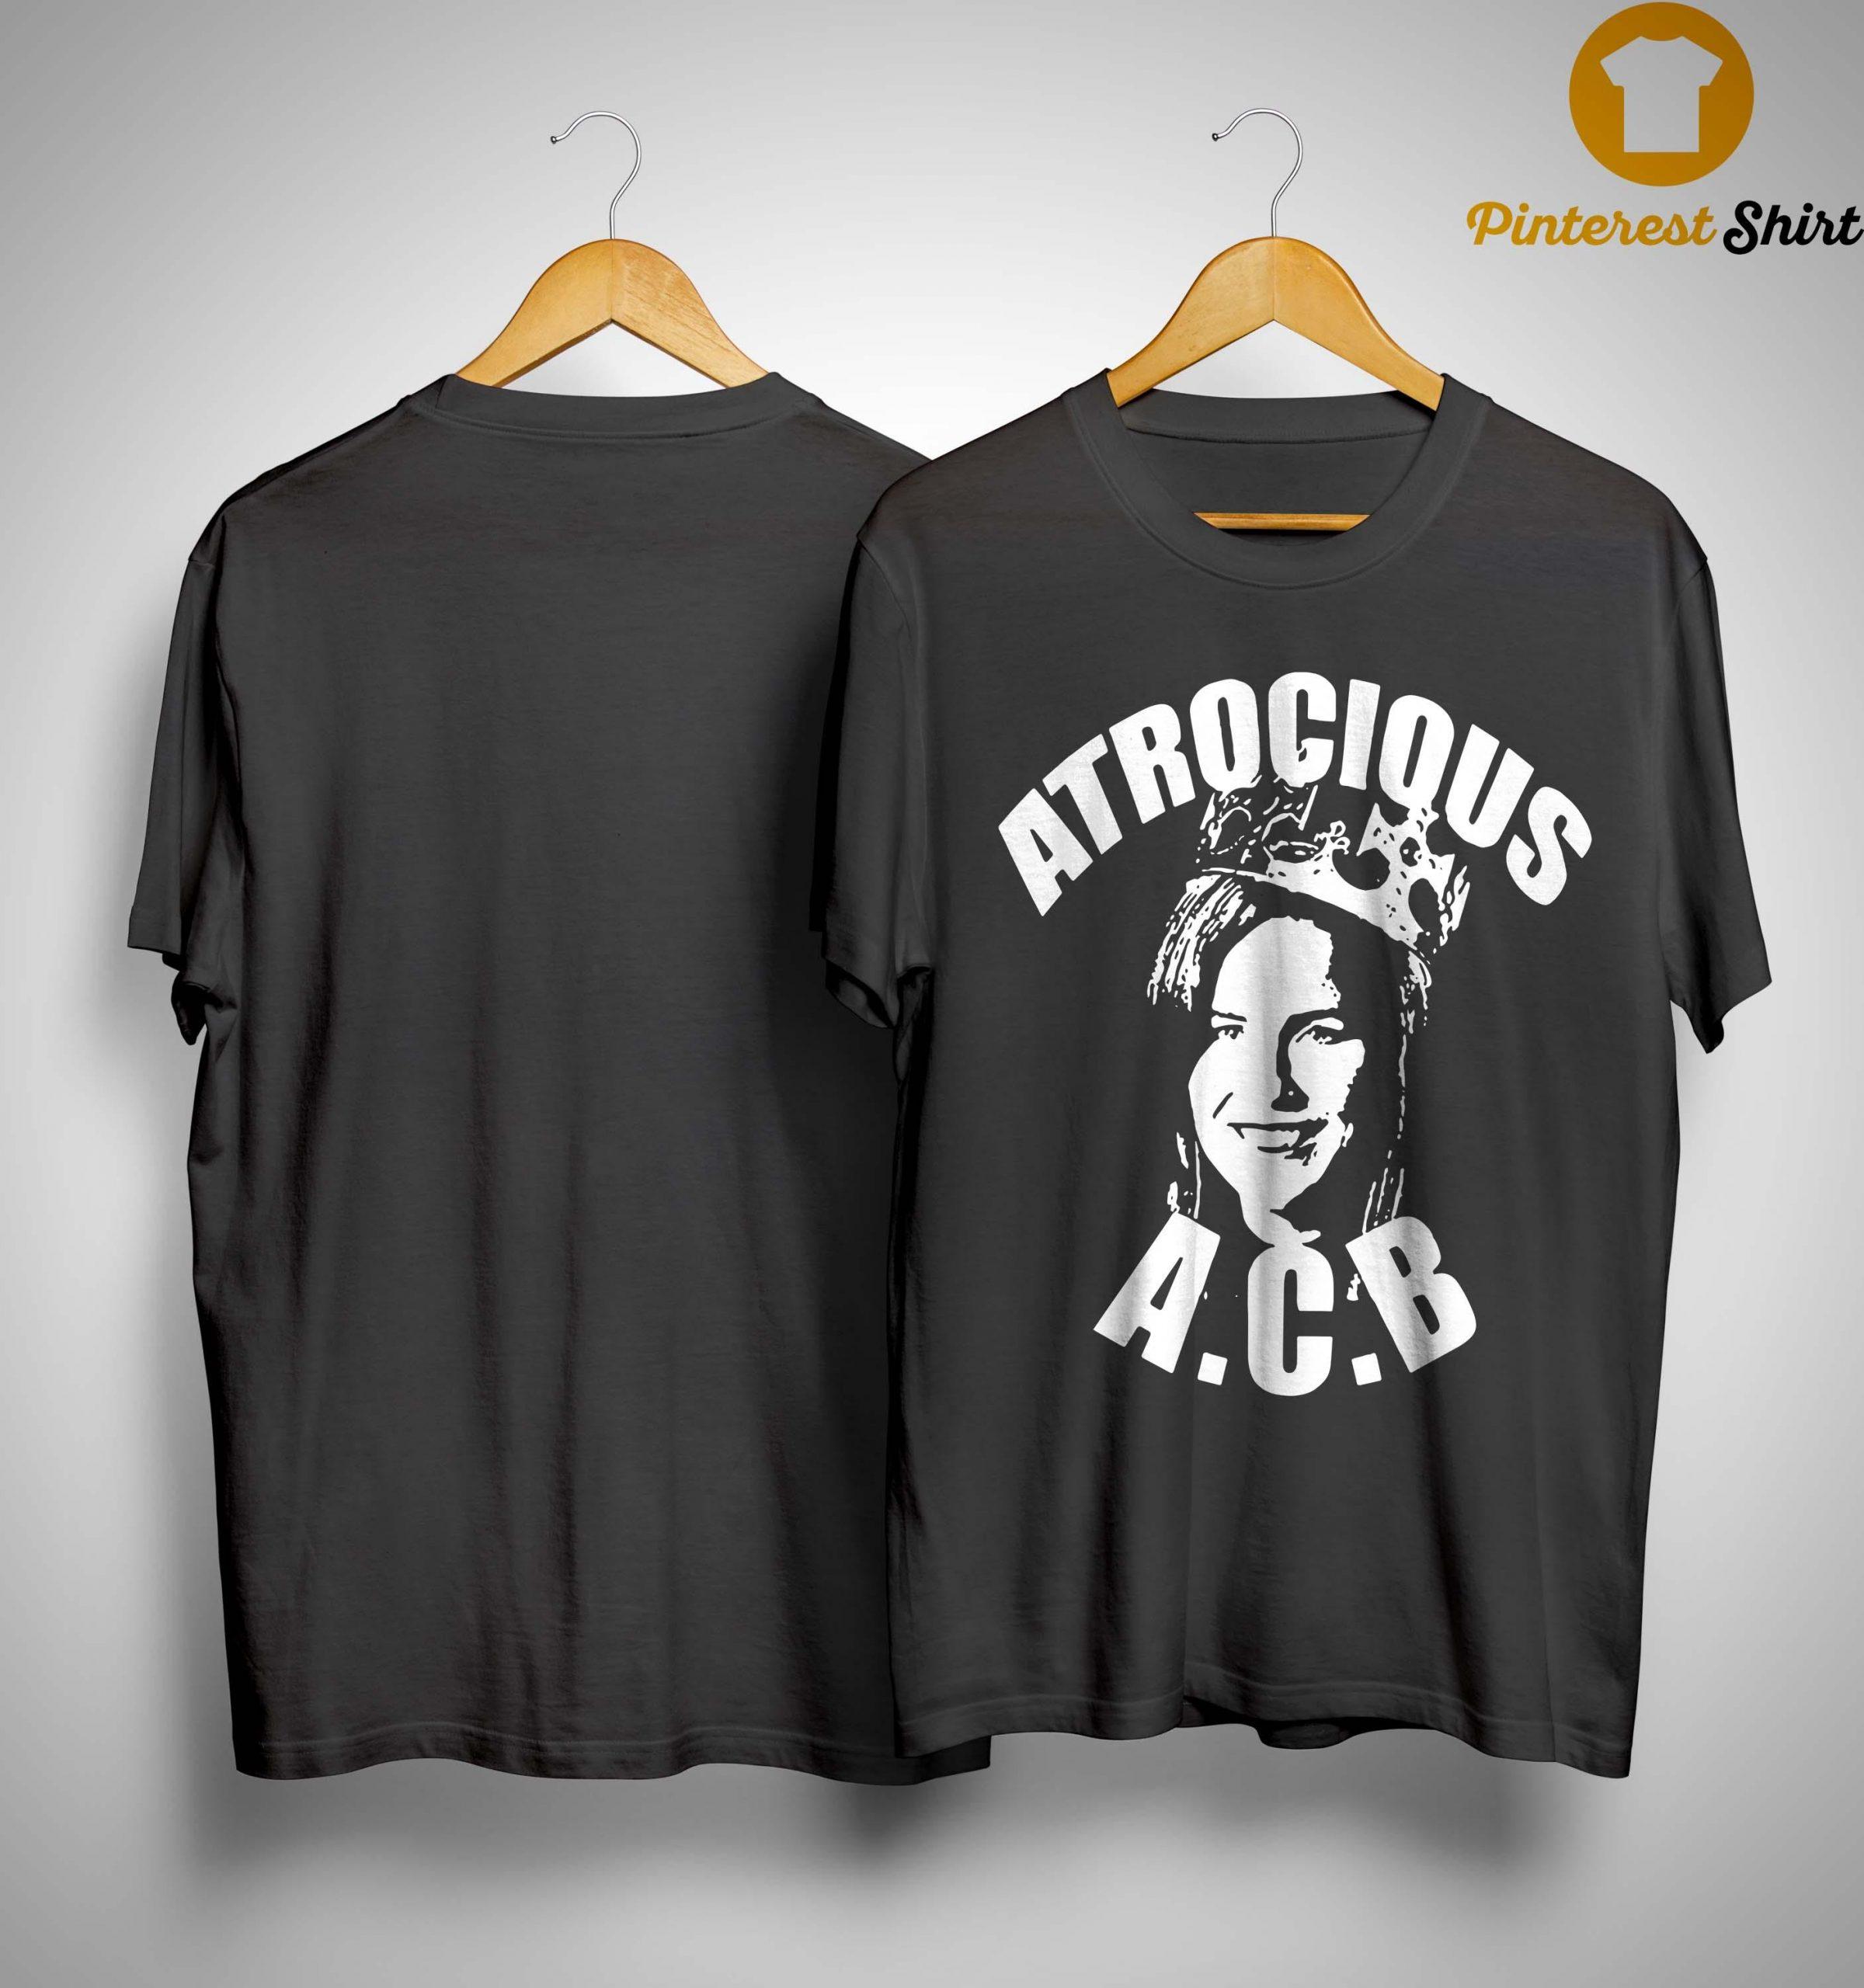 Notorious Acb Shirt